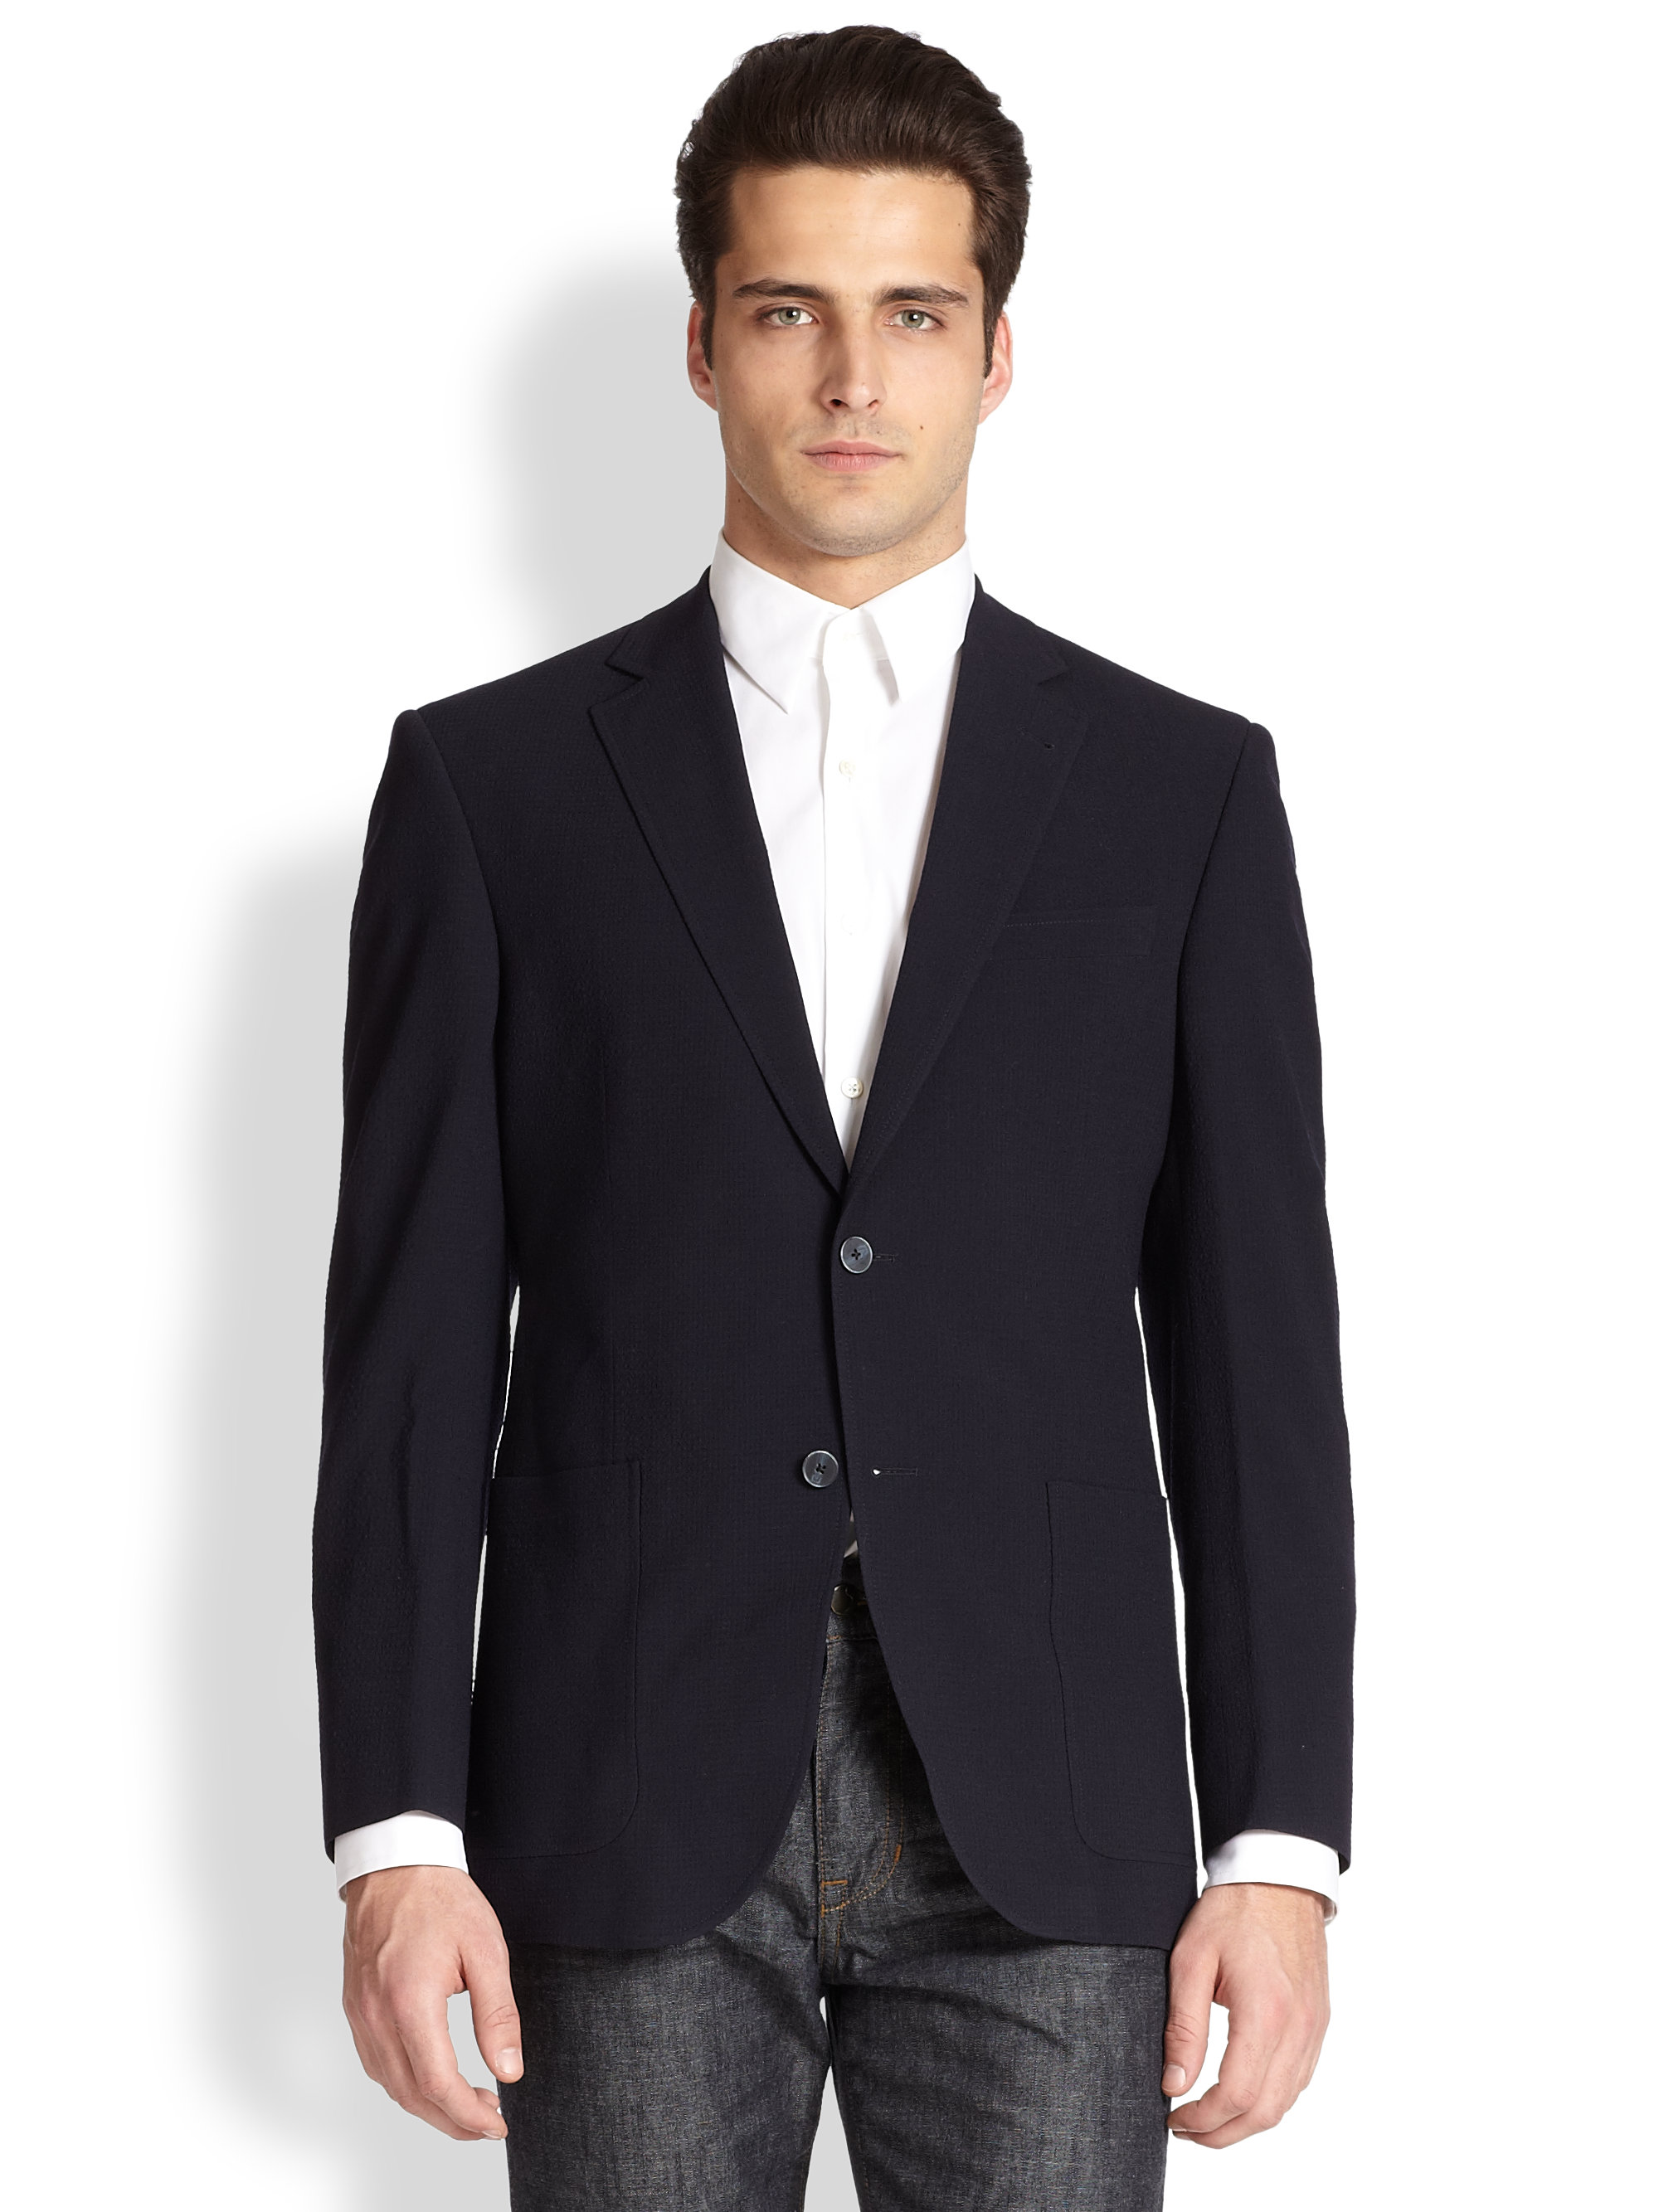 lyst saks fifth avenue solid wool seersucker blazer in blue for men. Black Bedroom Furniture Sets. Home Design Ideas